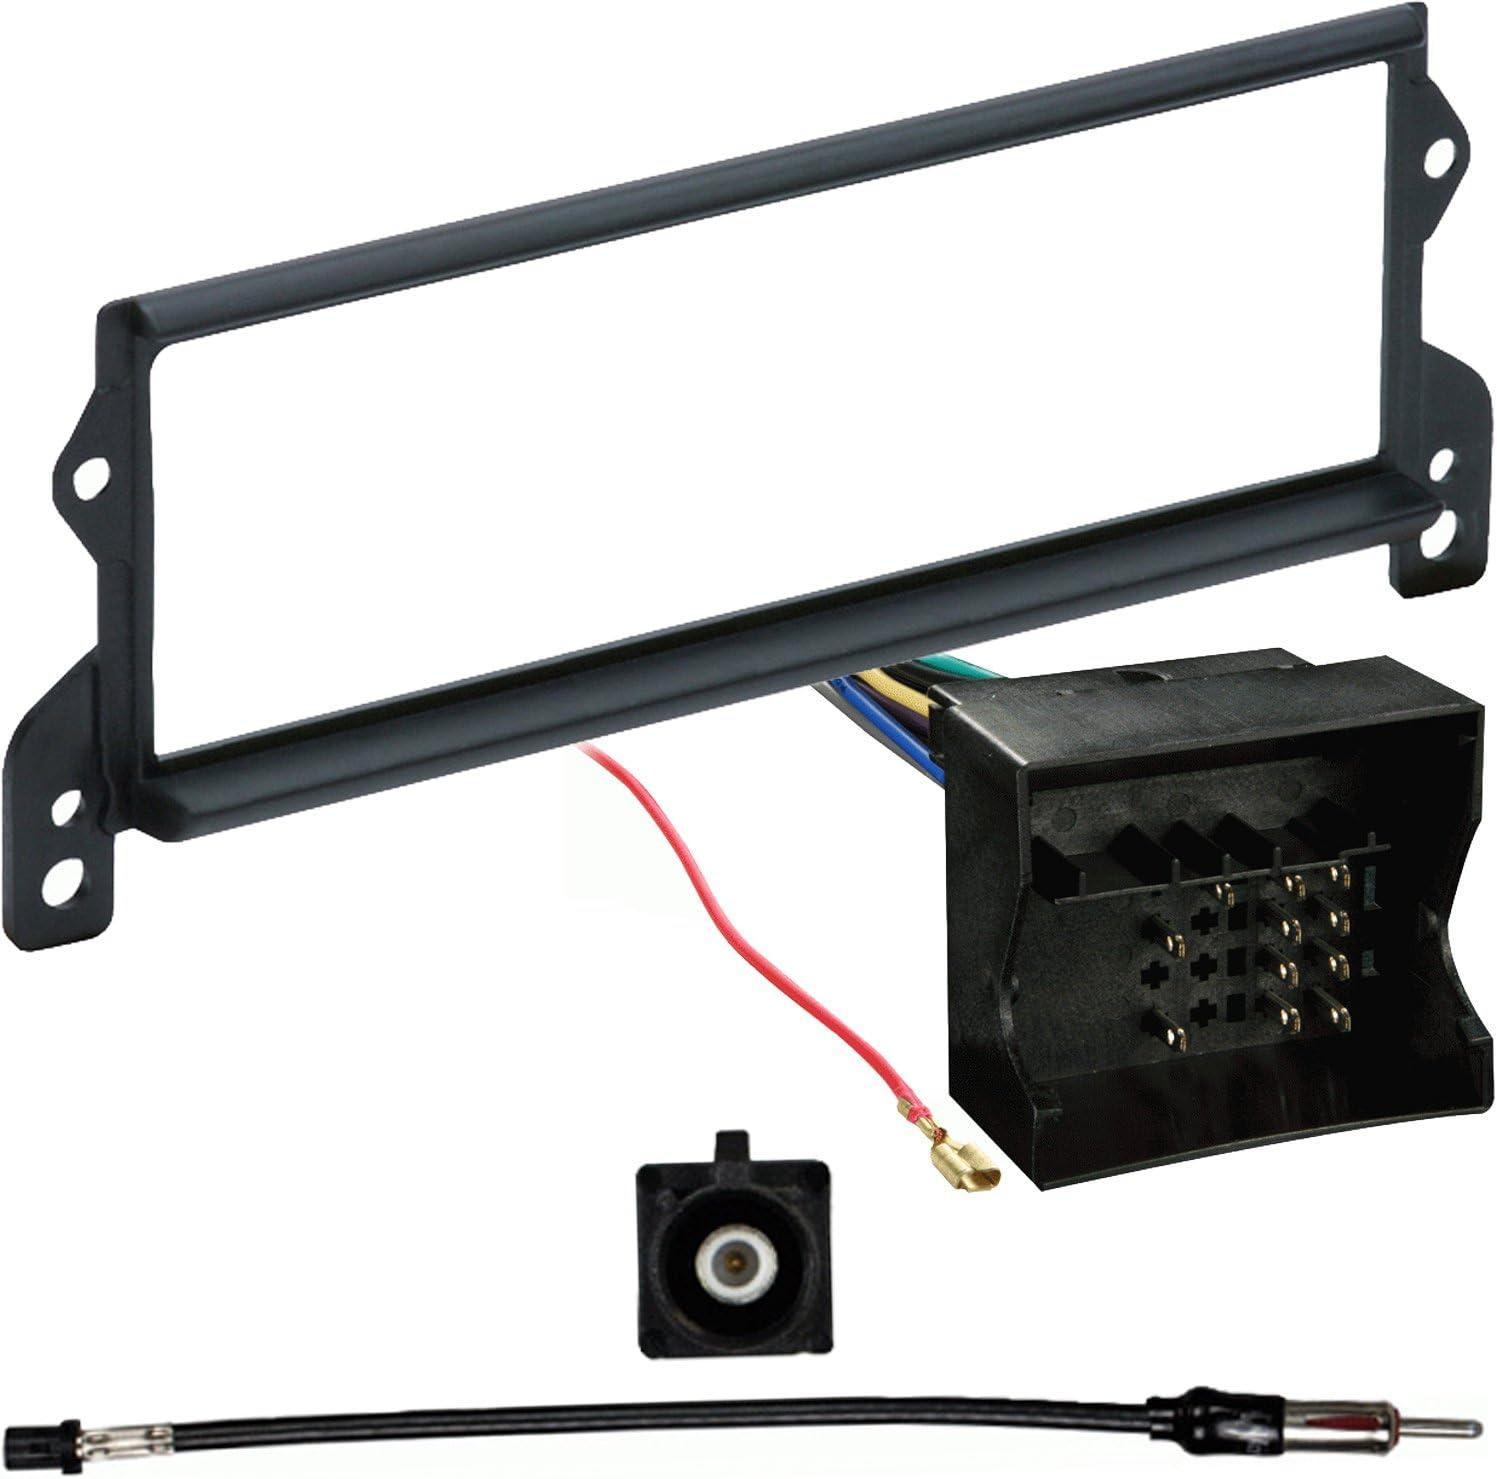 Antenna Adapter for Select Mini Cooper Harness Metra 99-9302 1-DIN Dash Kit